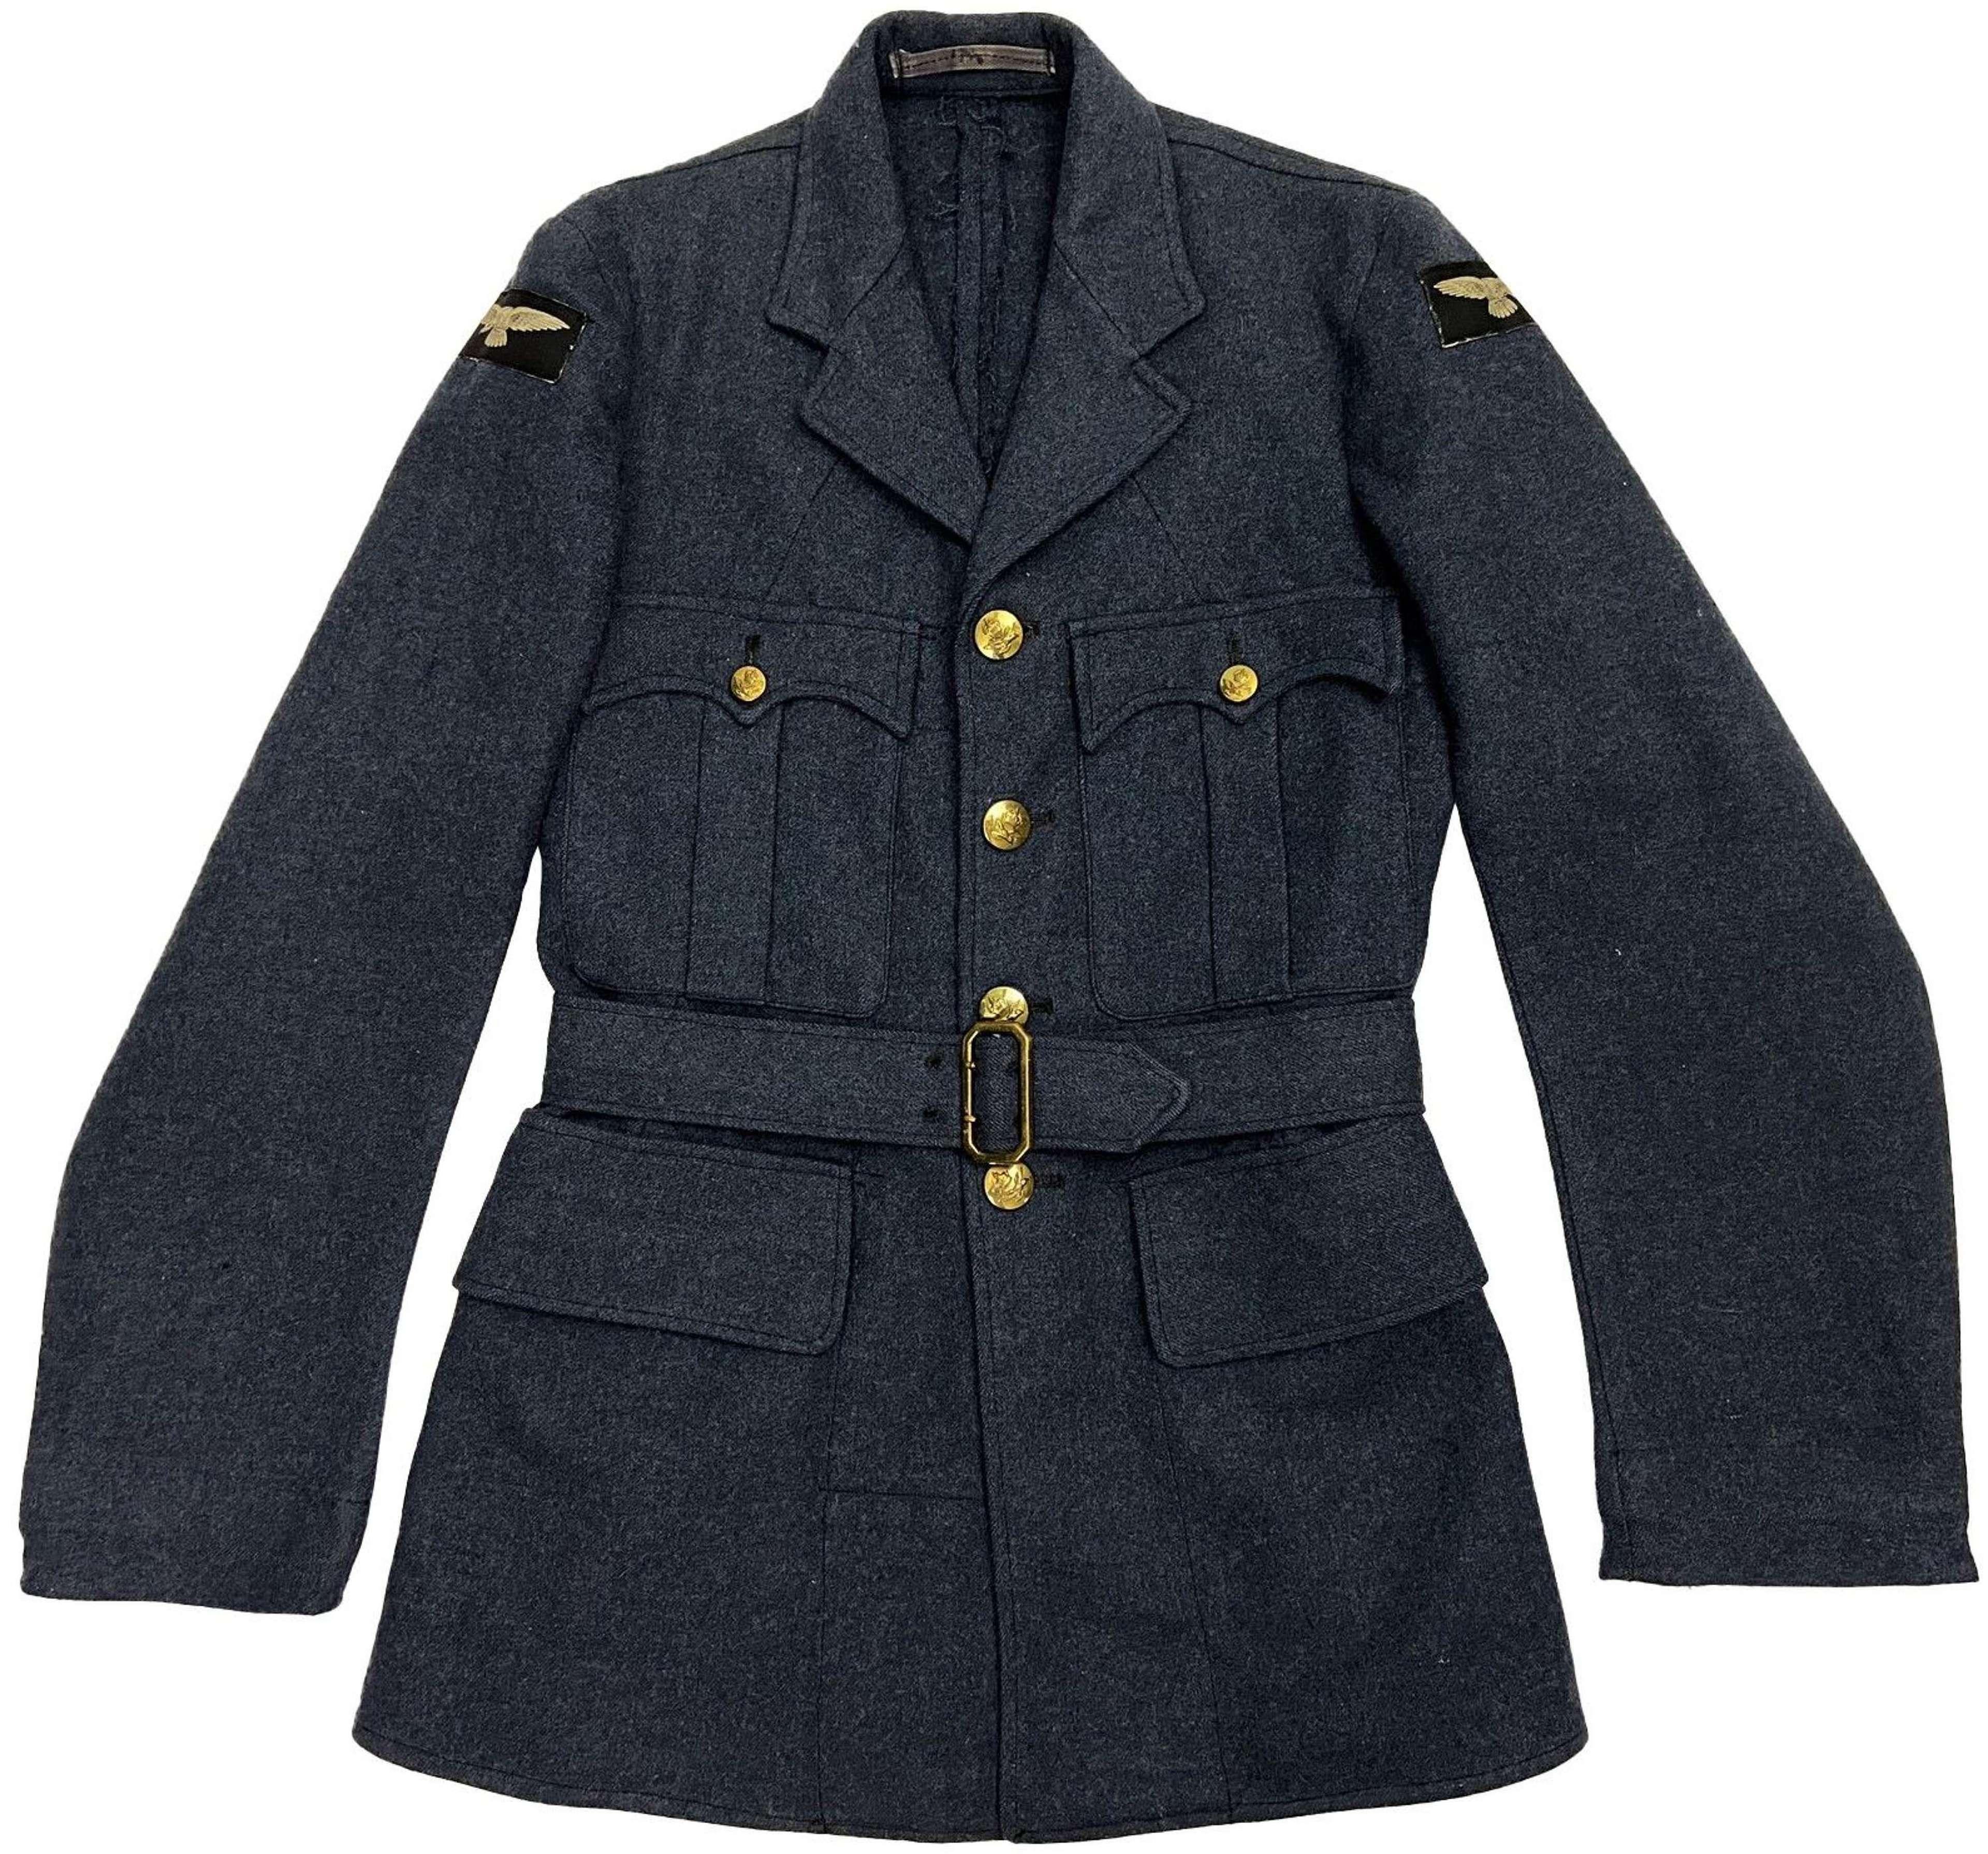 Original 1947 Dated RAF Ordinary Airman's Tunic - Size 10